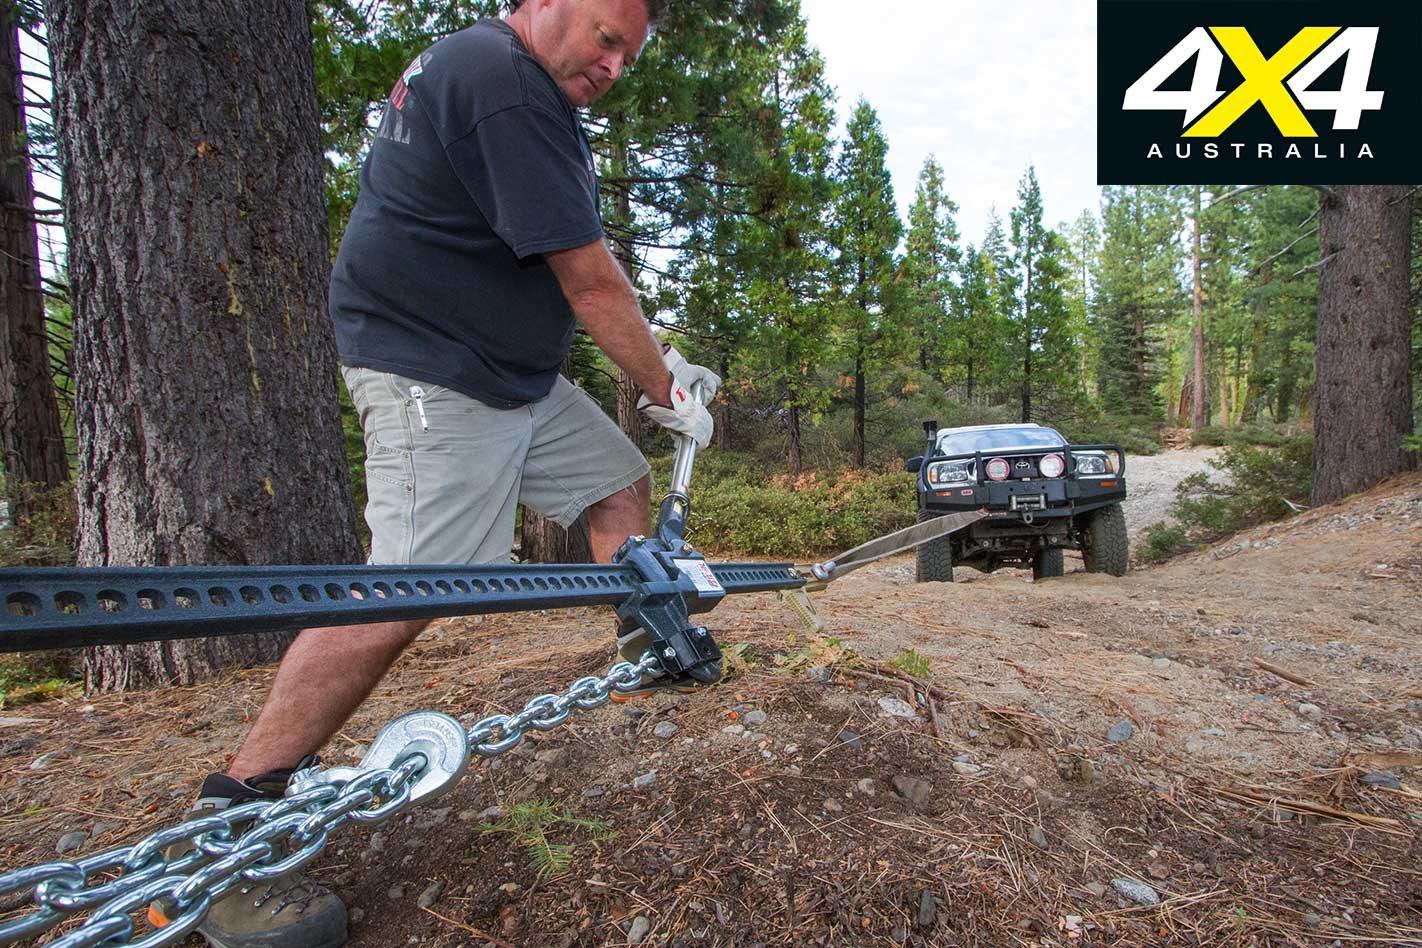 All-terrain jacks comparison test: 4x4 product test